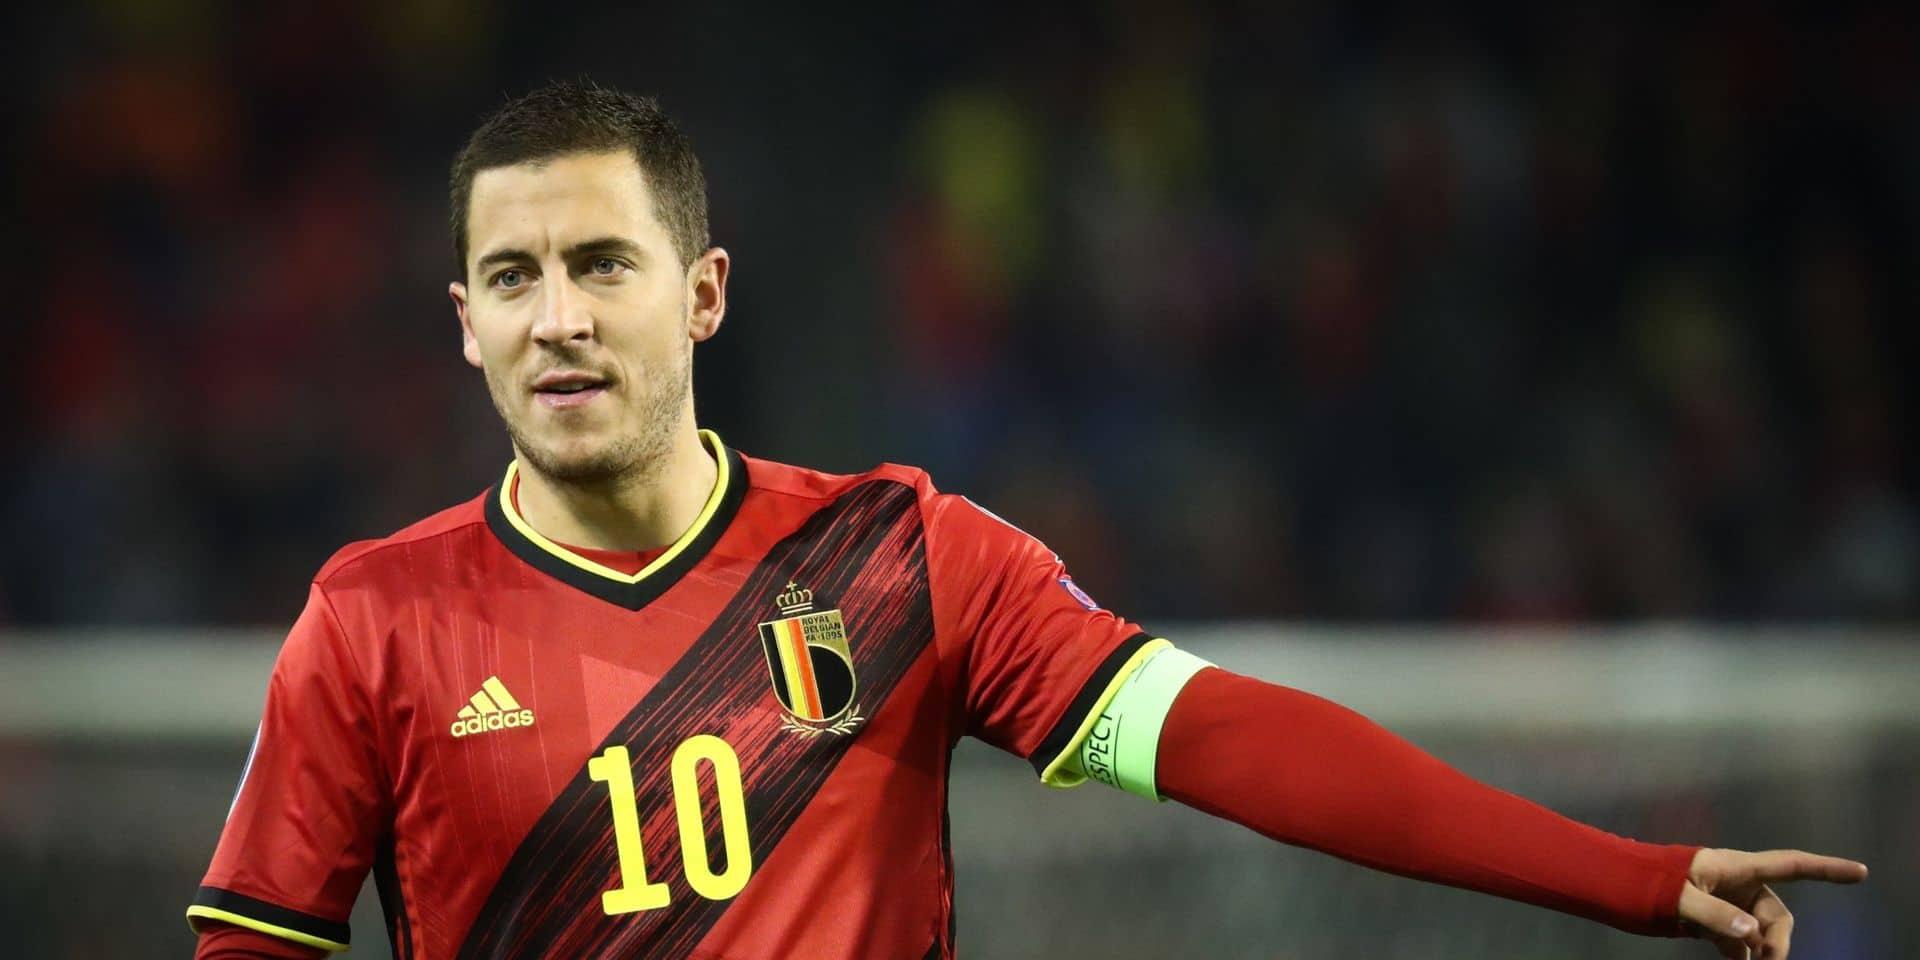 Eden Hazard et Jan Vertonghen absents de l'entraînement collectif mercredi